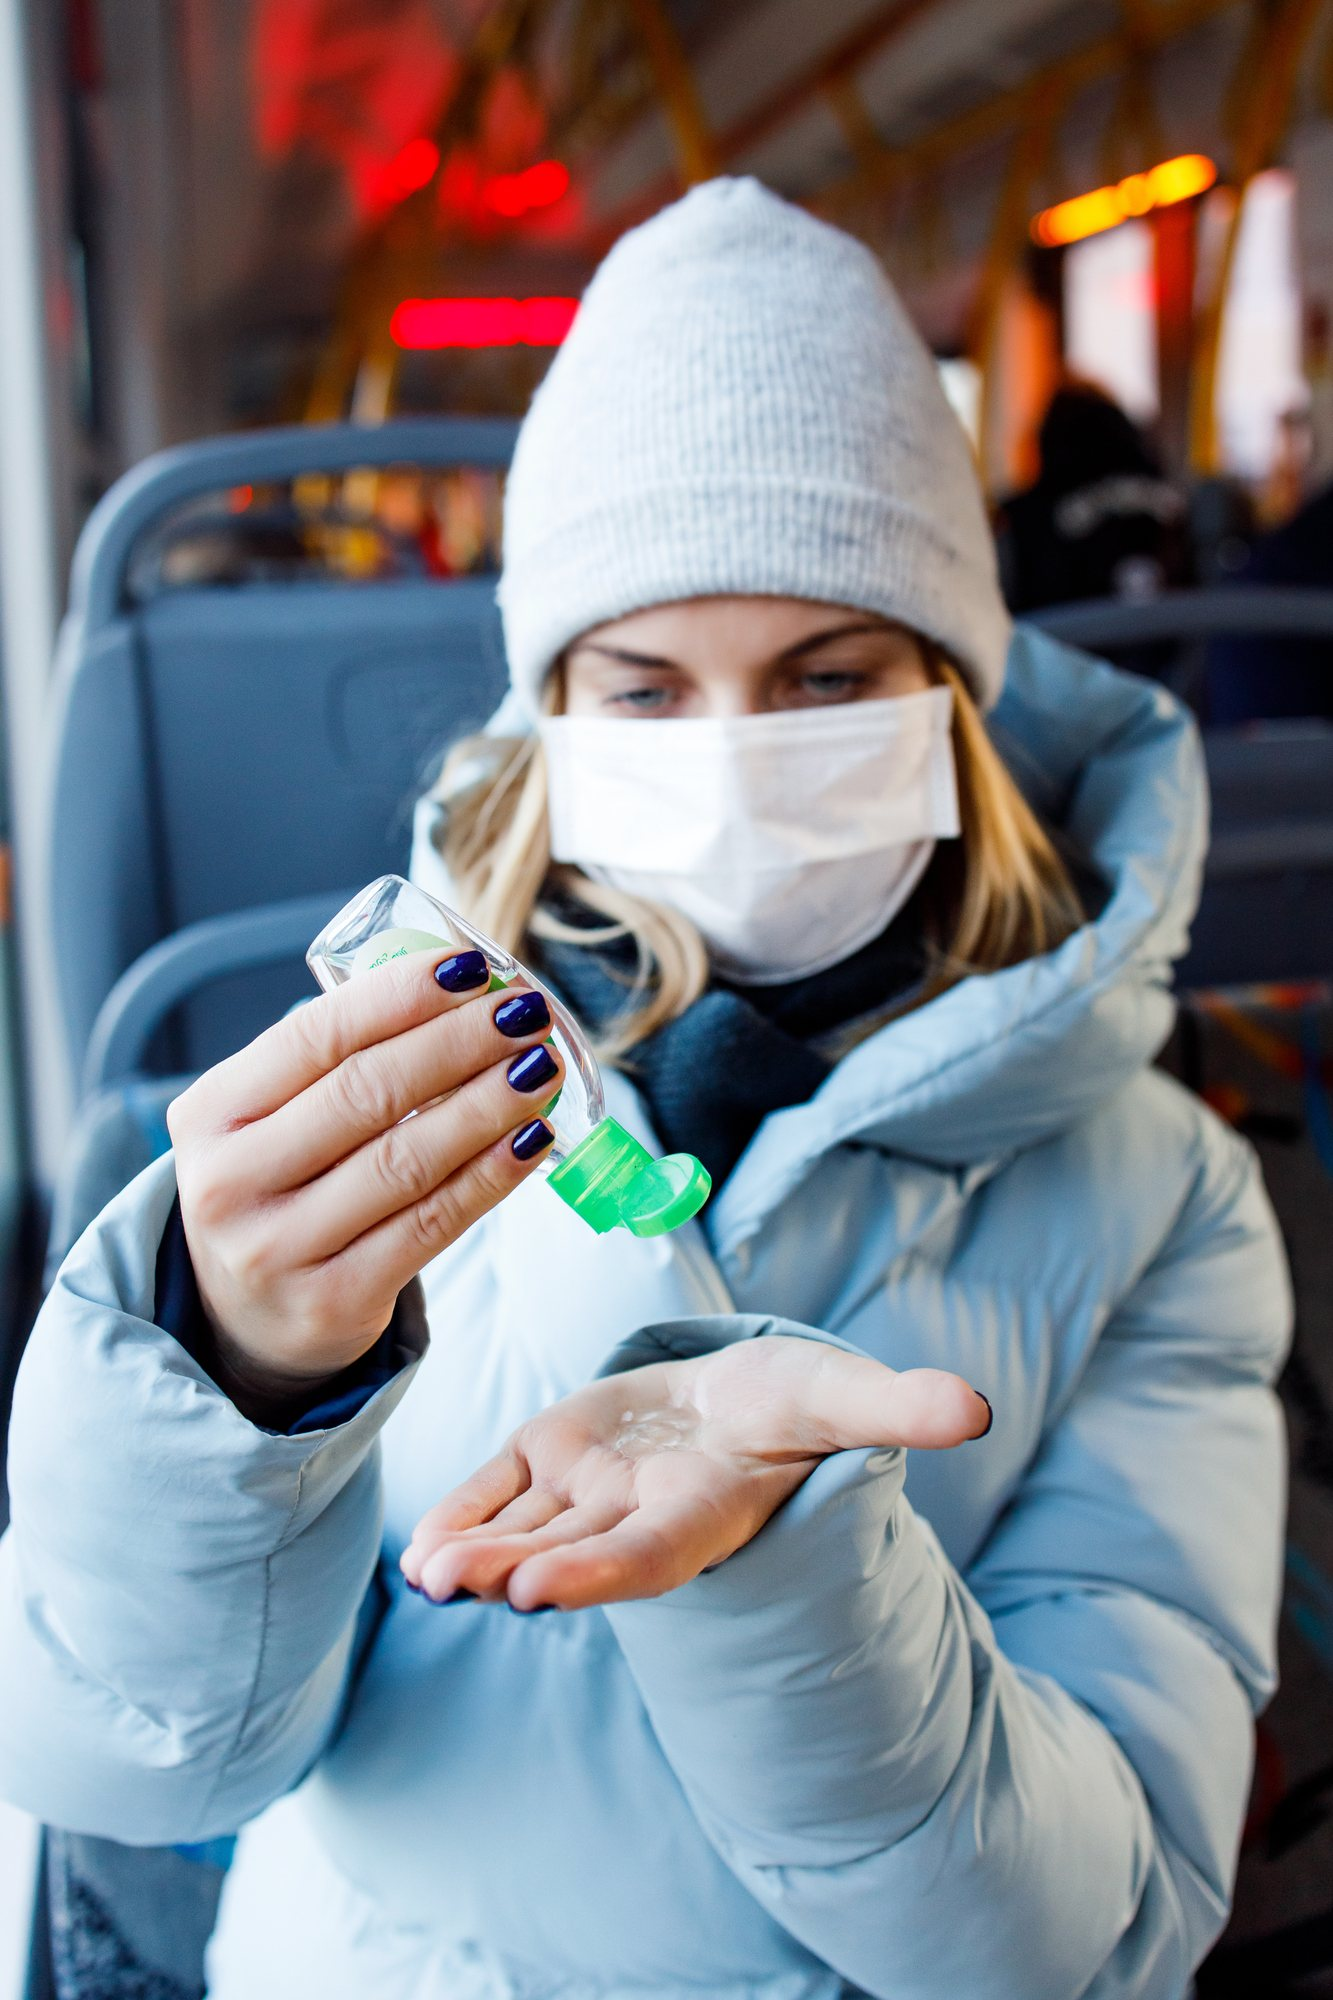 Woman wearing medical mask applying hand sanitizer regarding the Canadian consumer guide to the coronavirus